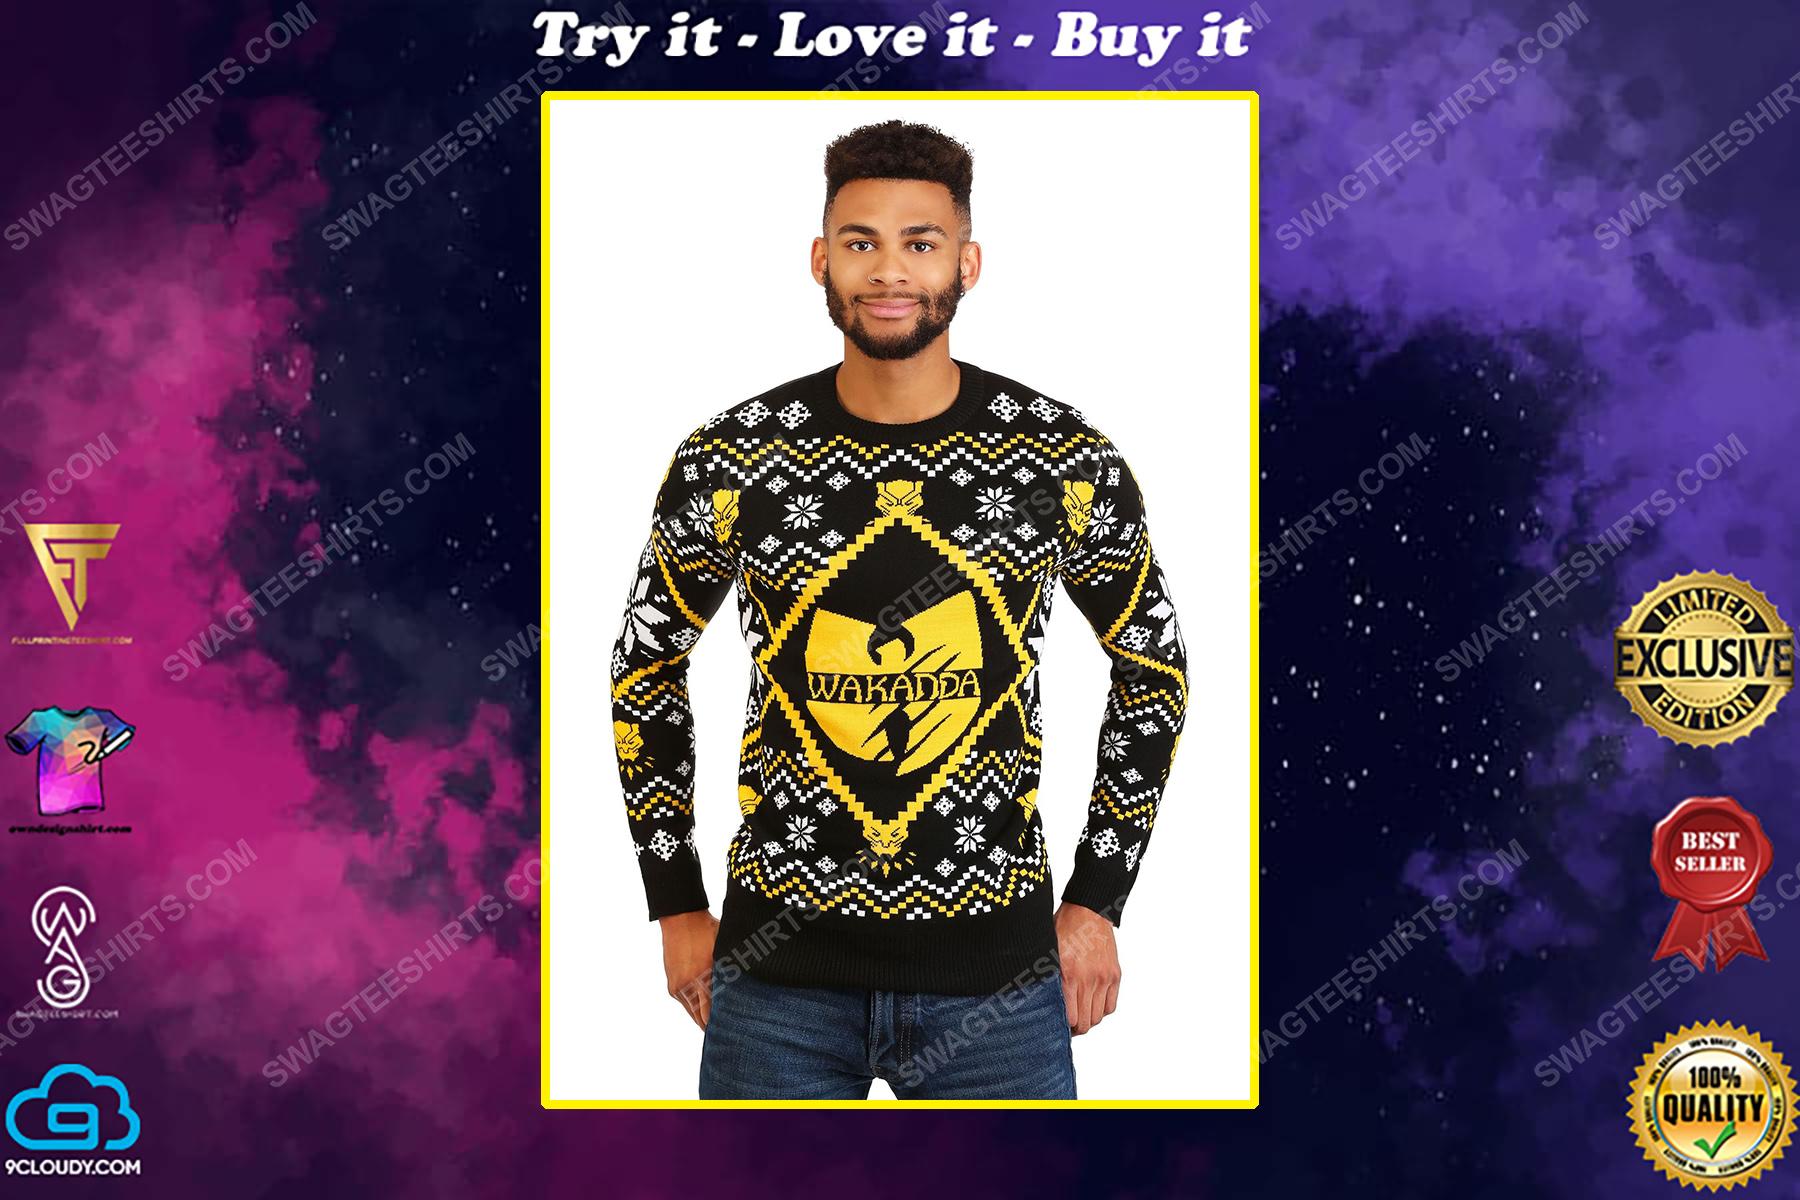 Wu tang clan black panther wakanda ugly christmas sweater